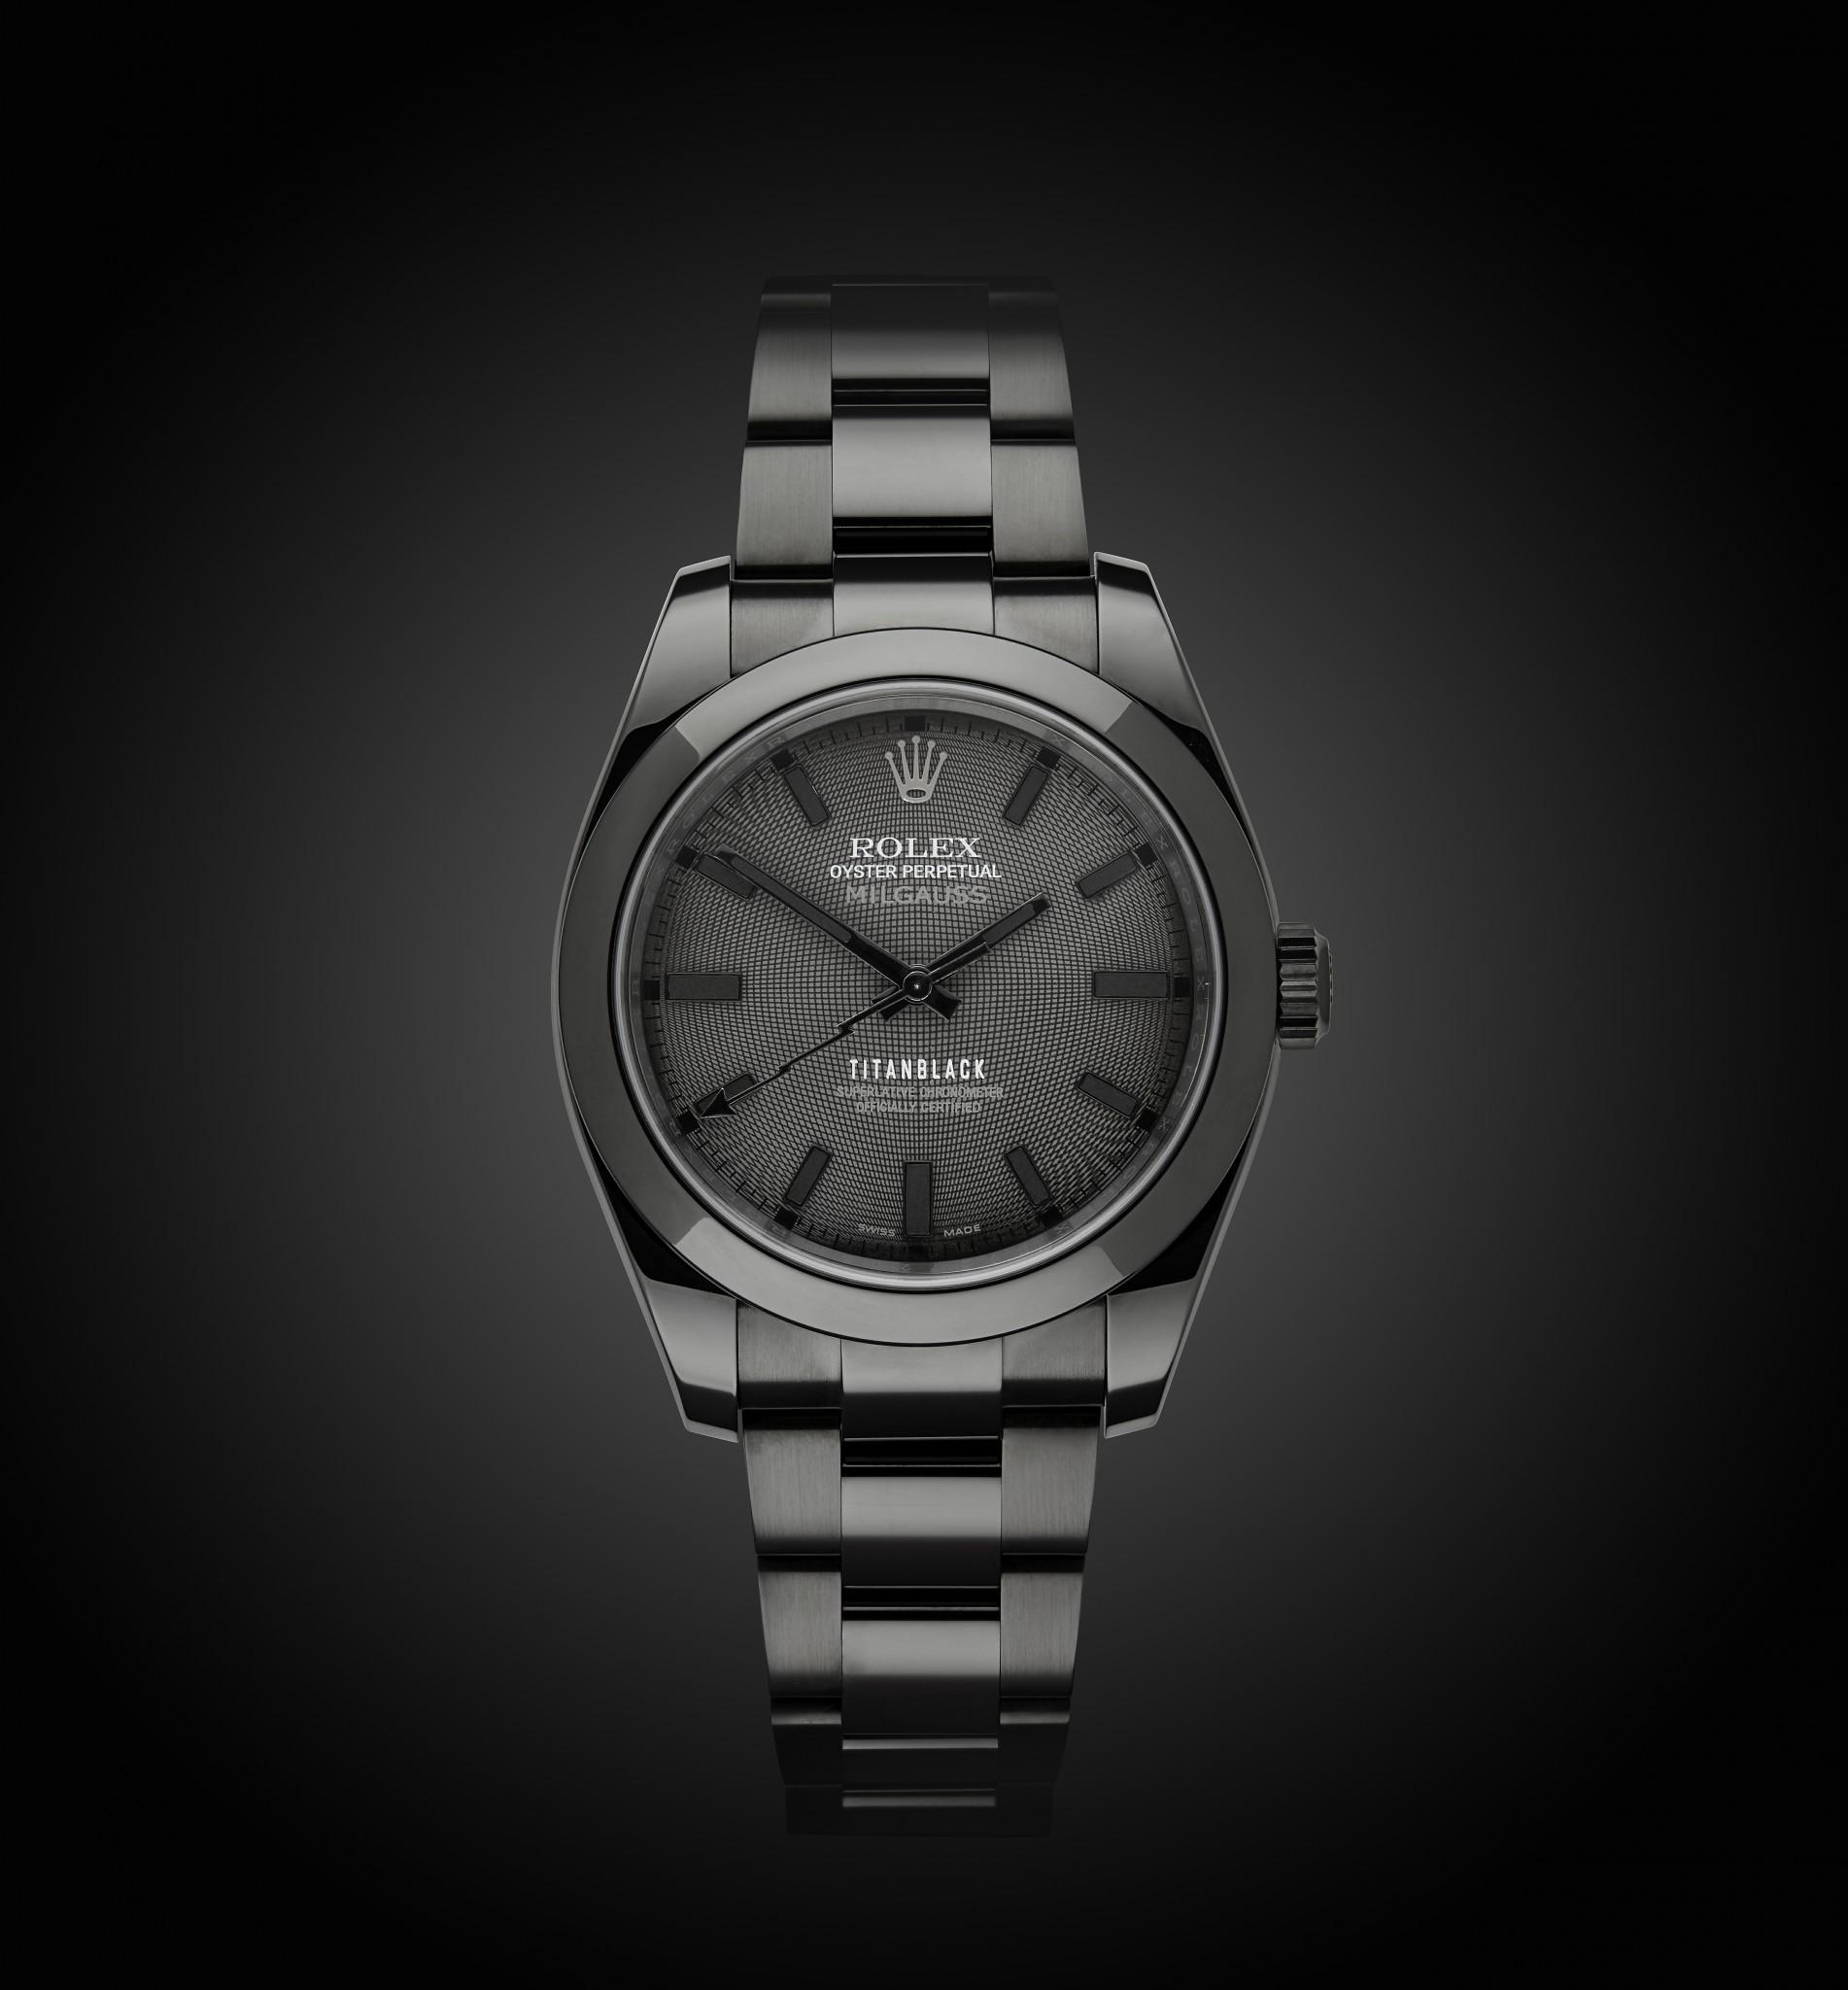 Rolex Milgauss Gravity Titan Black